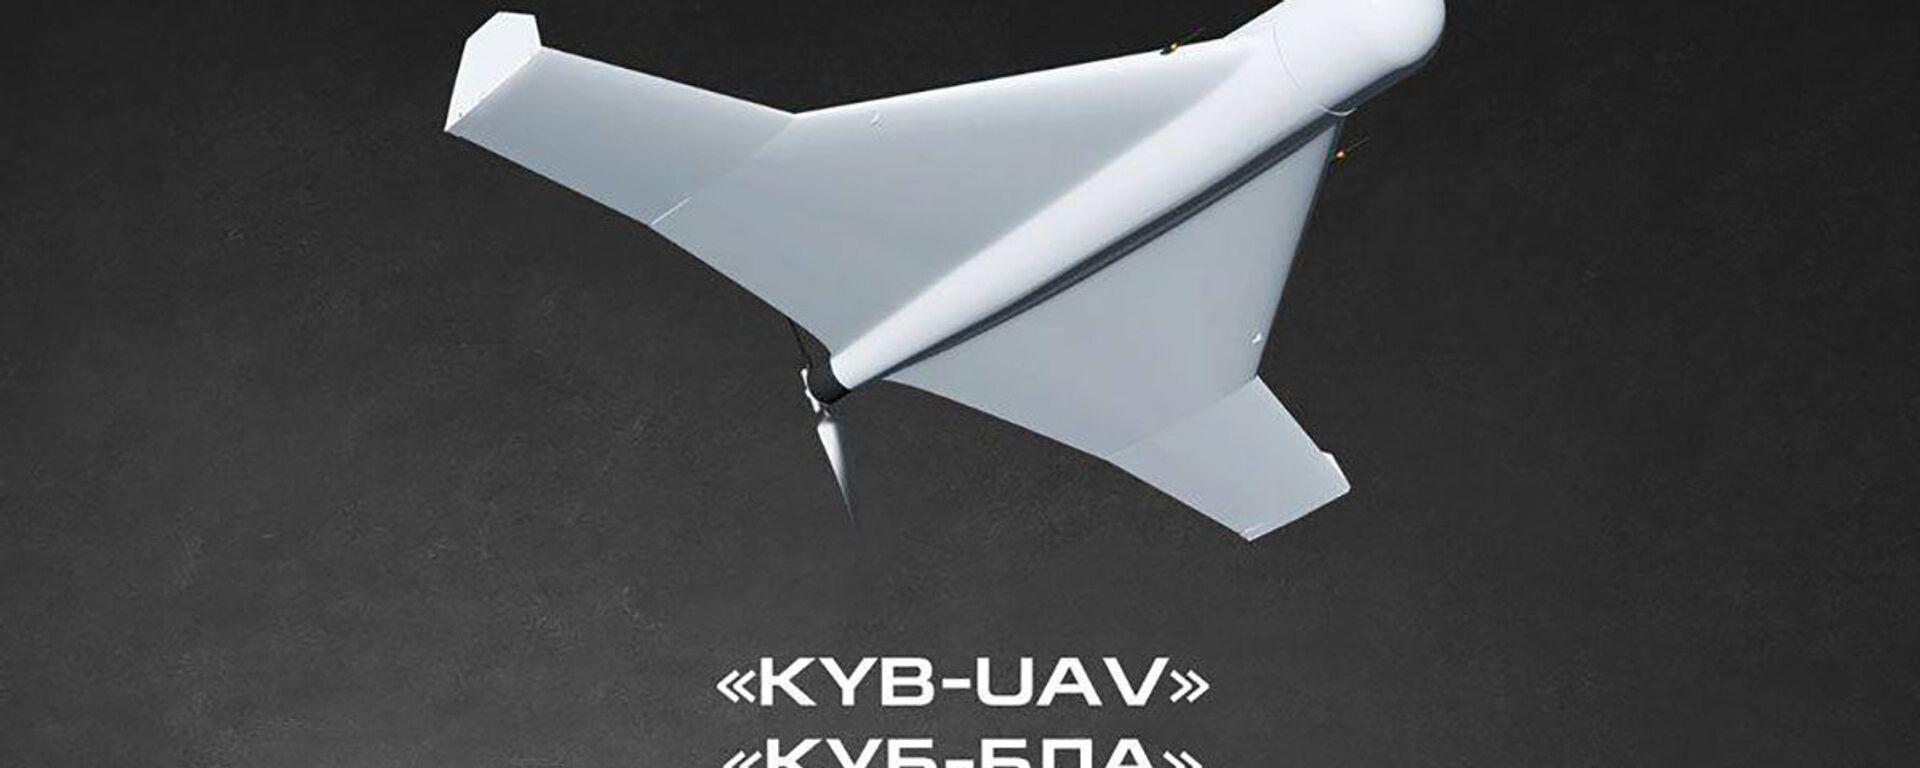 Dron-kamikadze KUB - Sputnik Polska, 1920, 22.08.2021